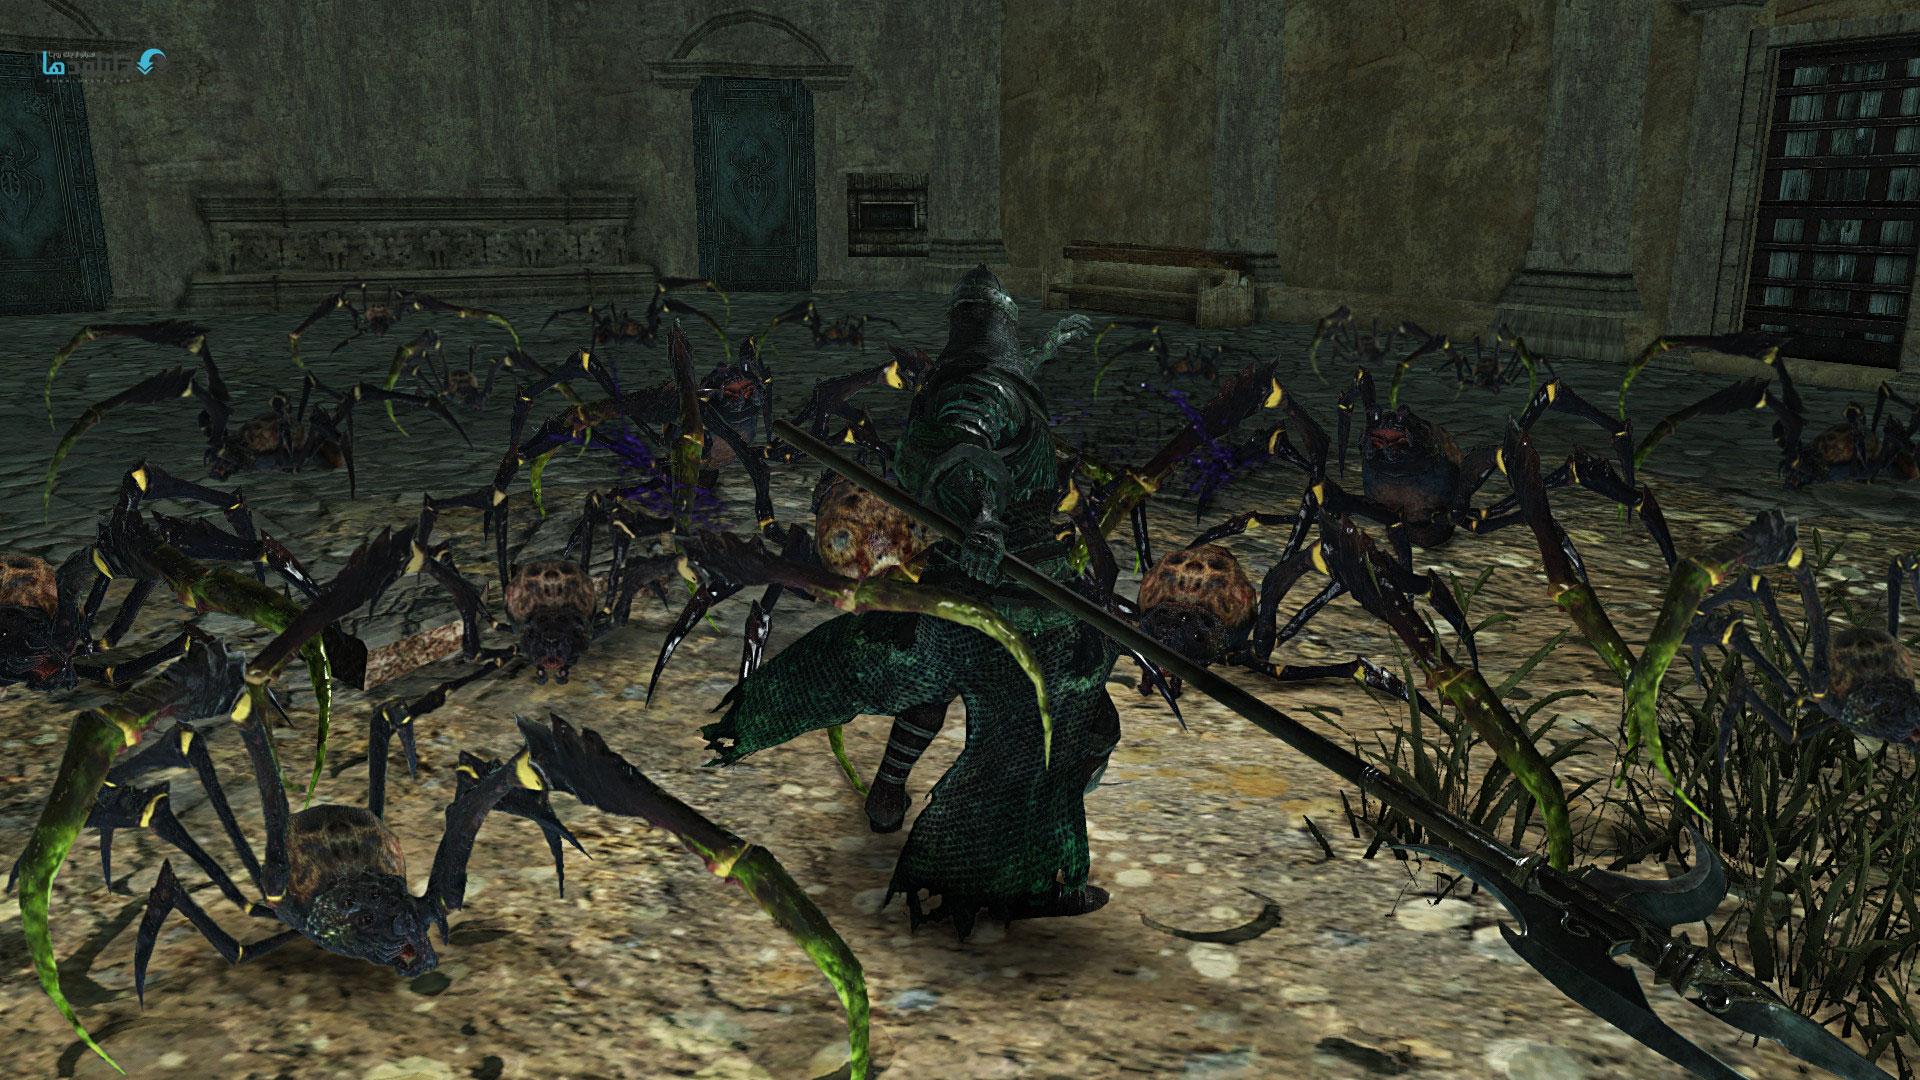 http://img5.downloadha.com/hosein/Game/April%202015/02/Dark-Souls-II-Scholar-of-the-First-Sin-screenshots-02-large.jpg